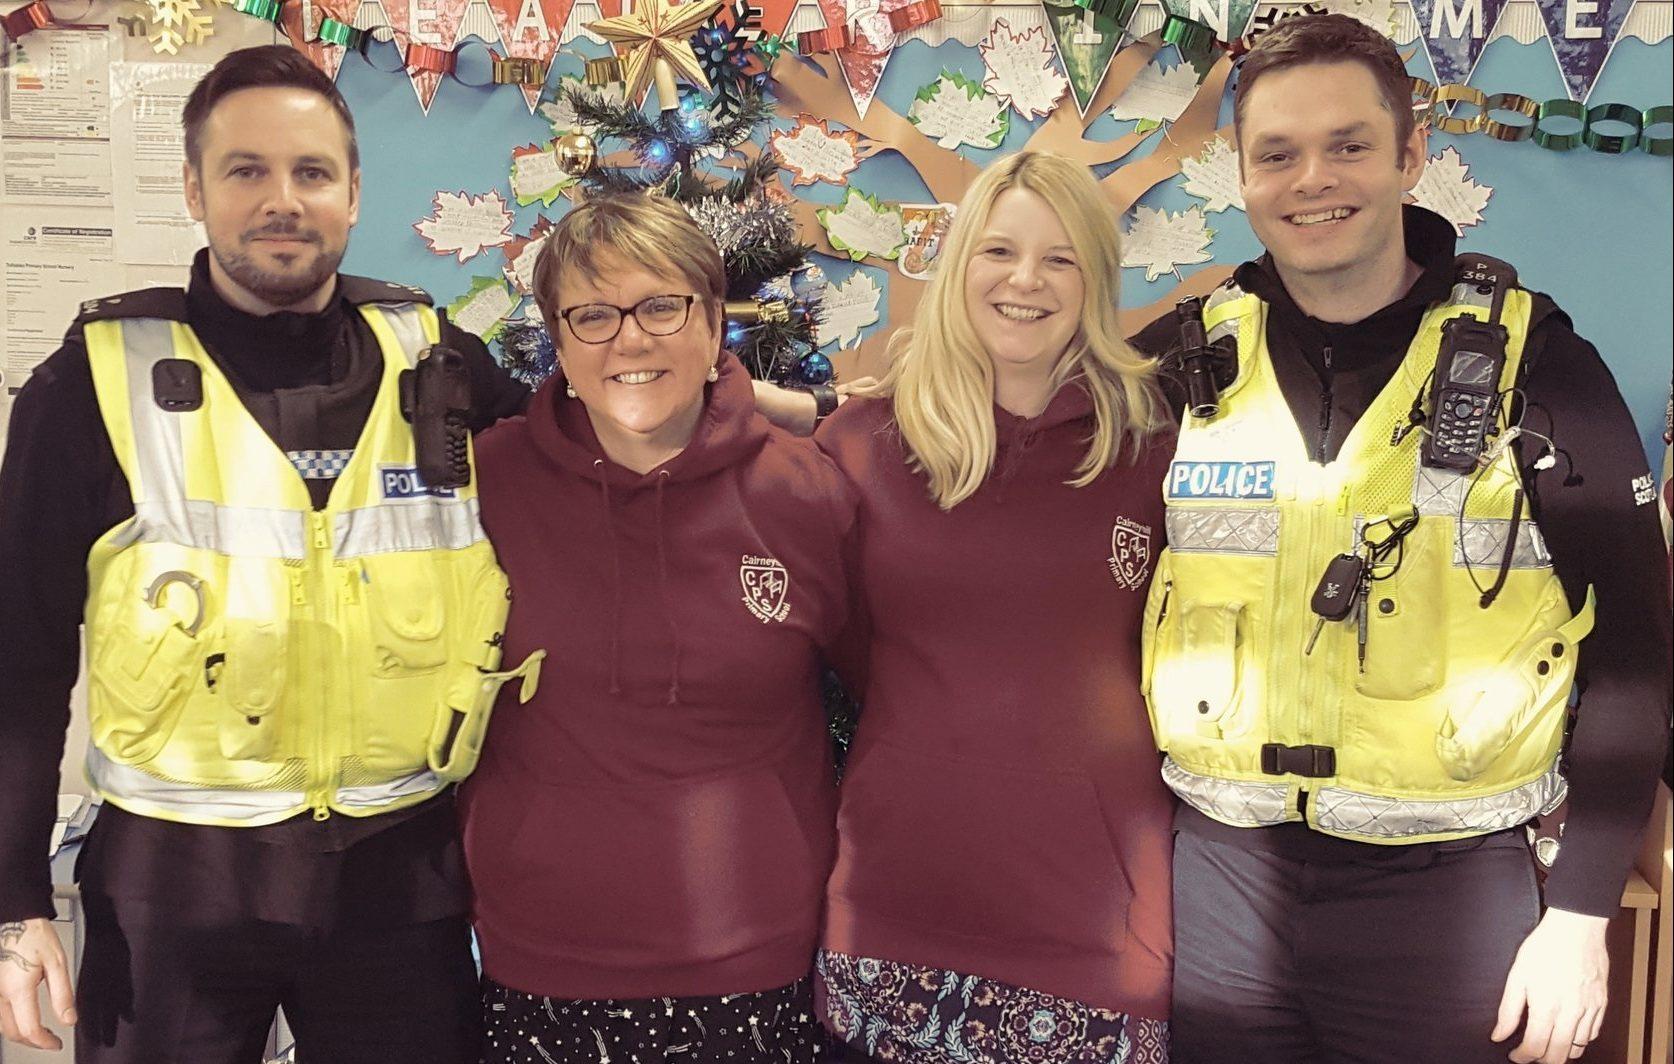 PC Kev Chandler, headteacher Fiona Hall, depute head Georgette Price, and PC Ian Fraser.